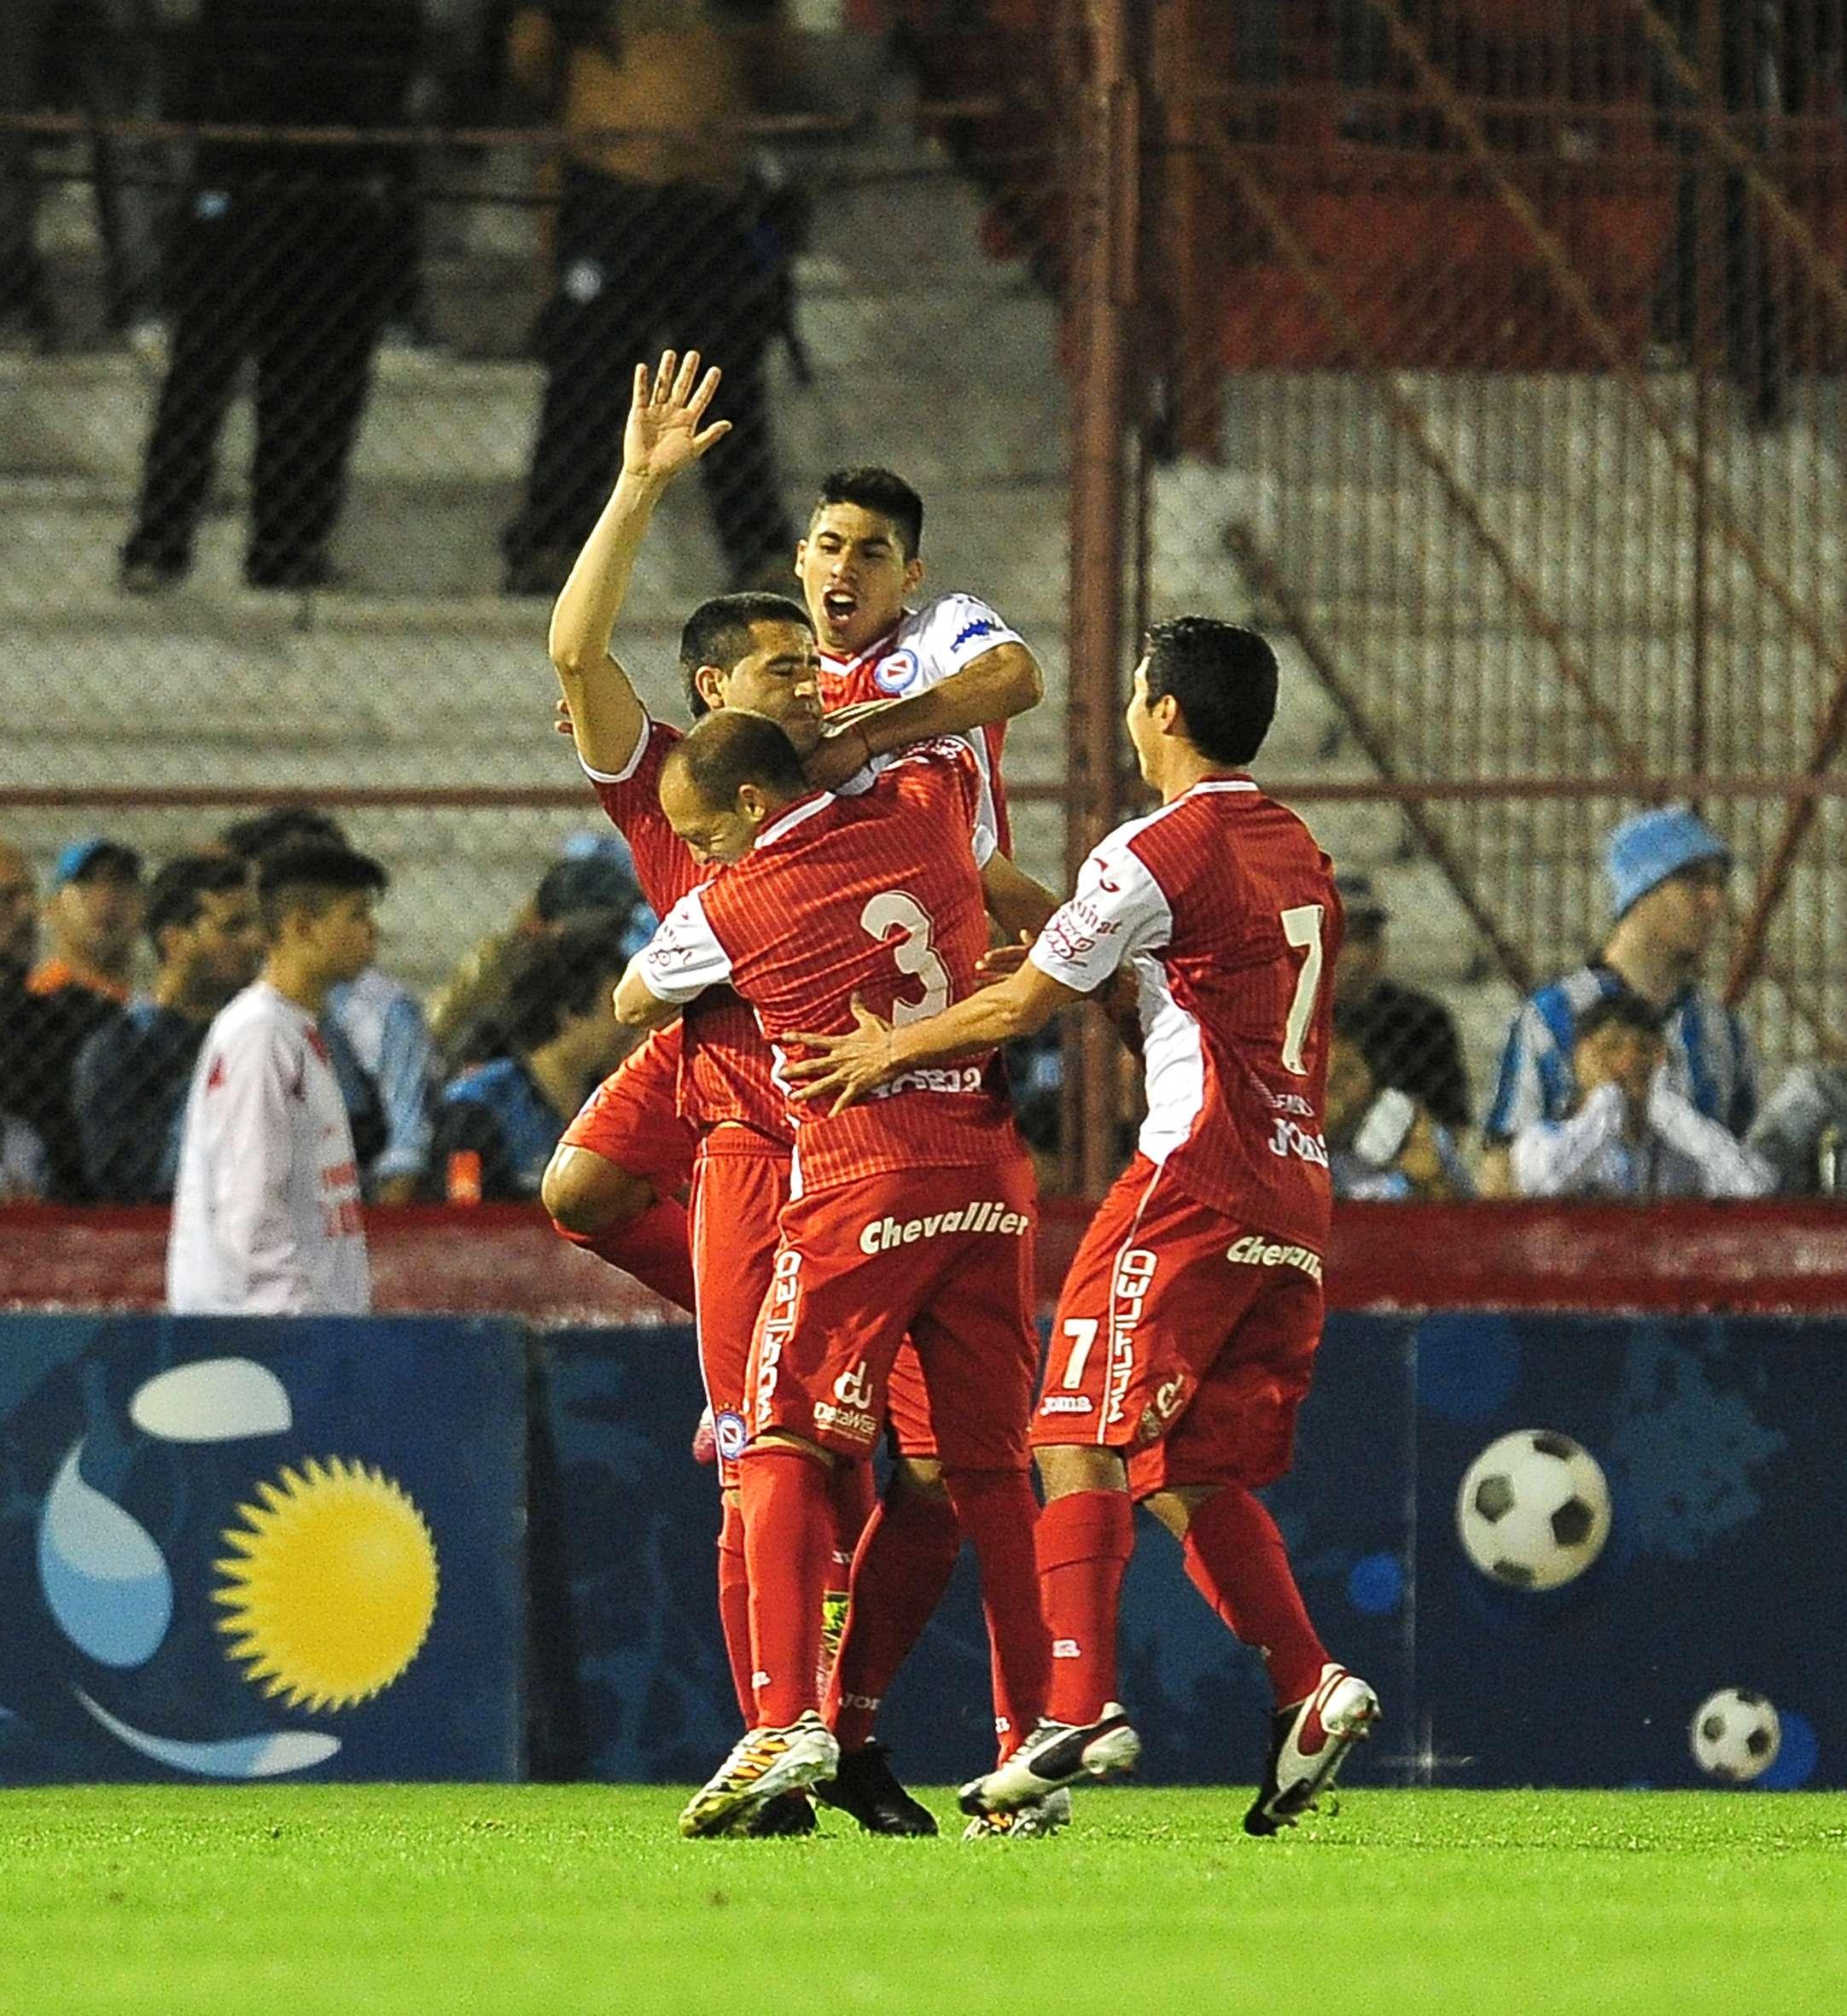 Juan Román Riquelme marcó el único gol del partido en el que Argentinos Juniors eliminó a Racing de la Copa Argentina Foto: Agencias